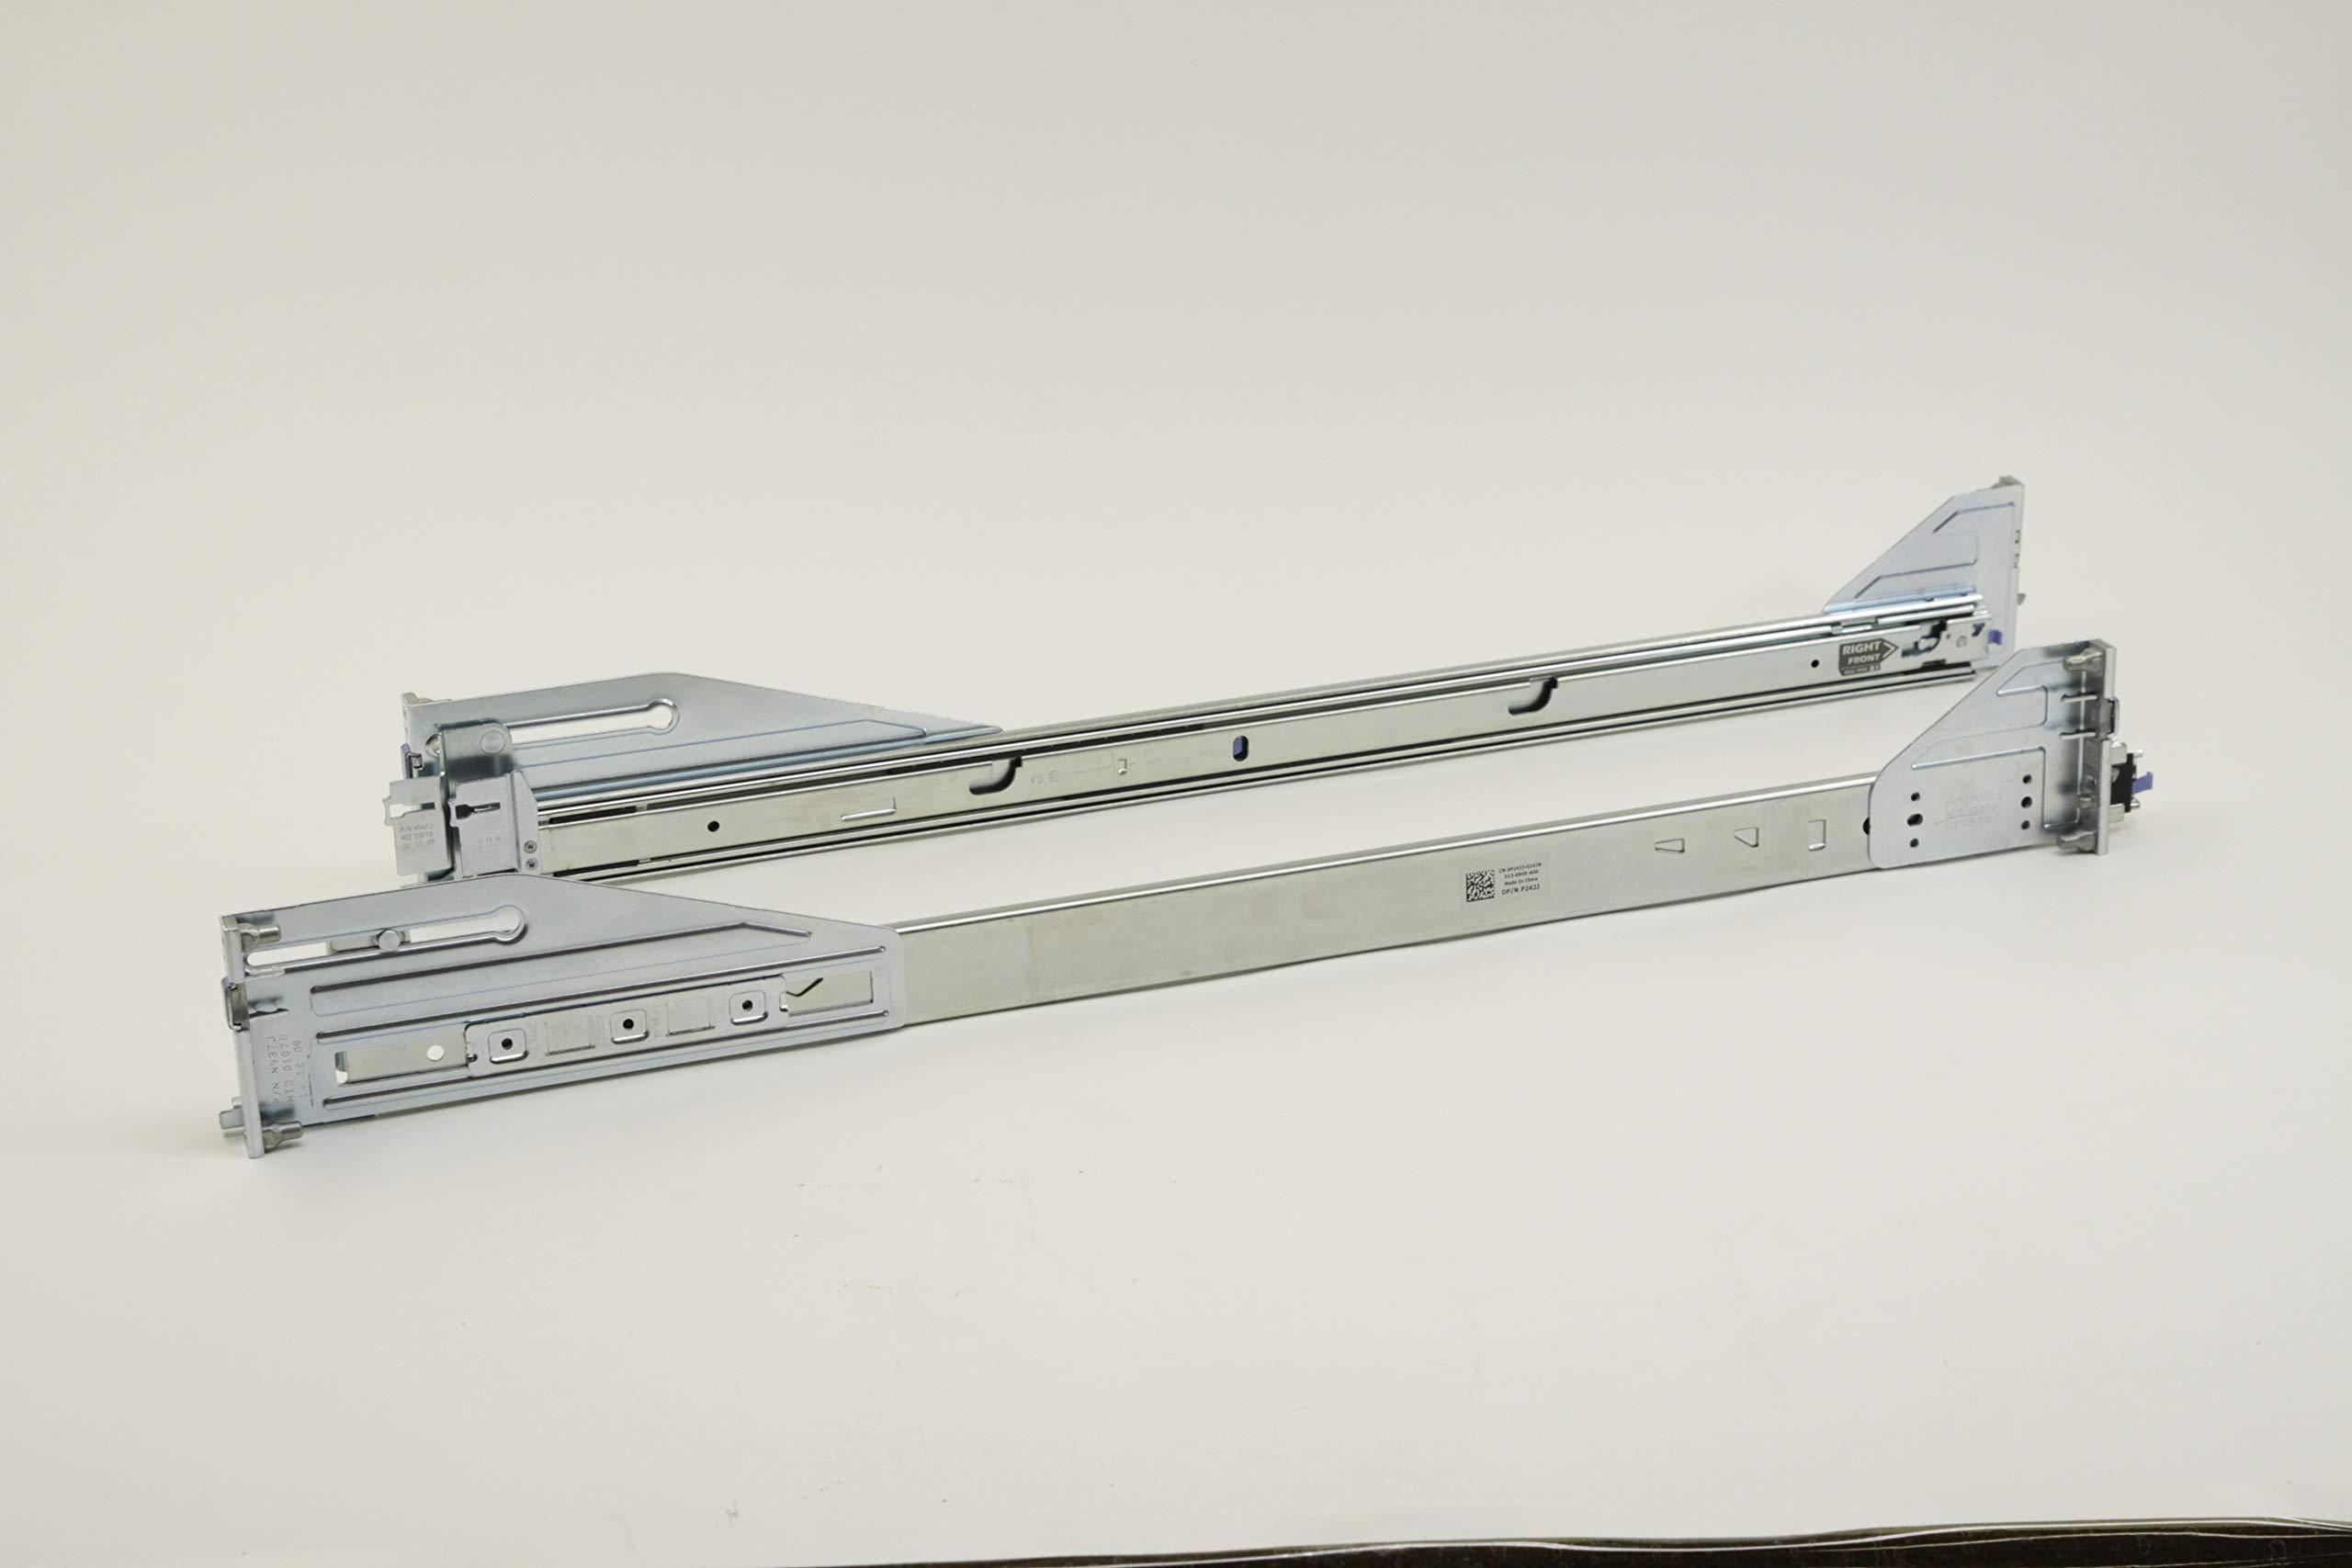 P188C New Dell PowerEdge R710 Server 2U Sliding Readyrail Kit P187C (Renewed) by Dell (Image #1)